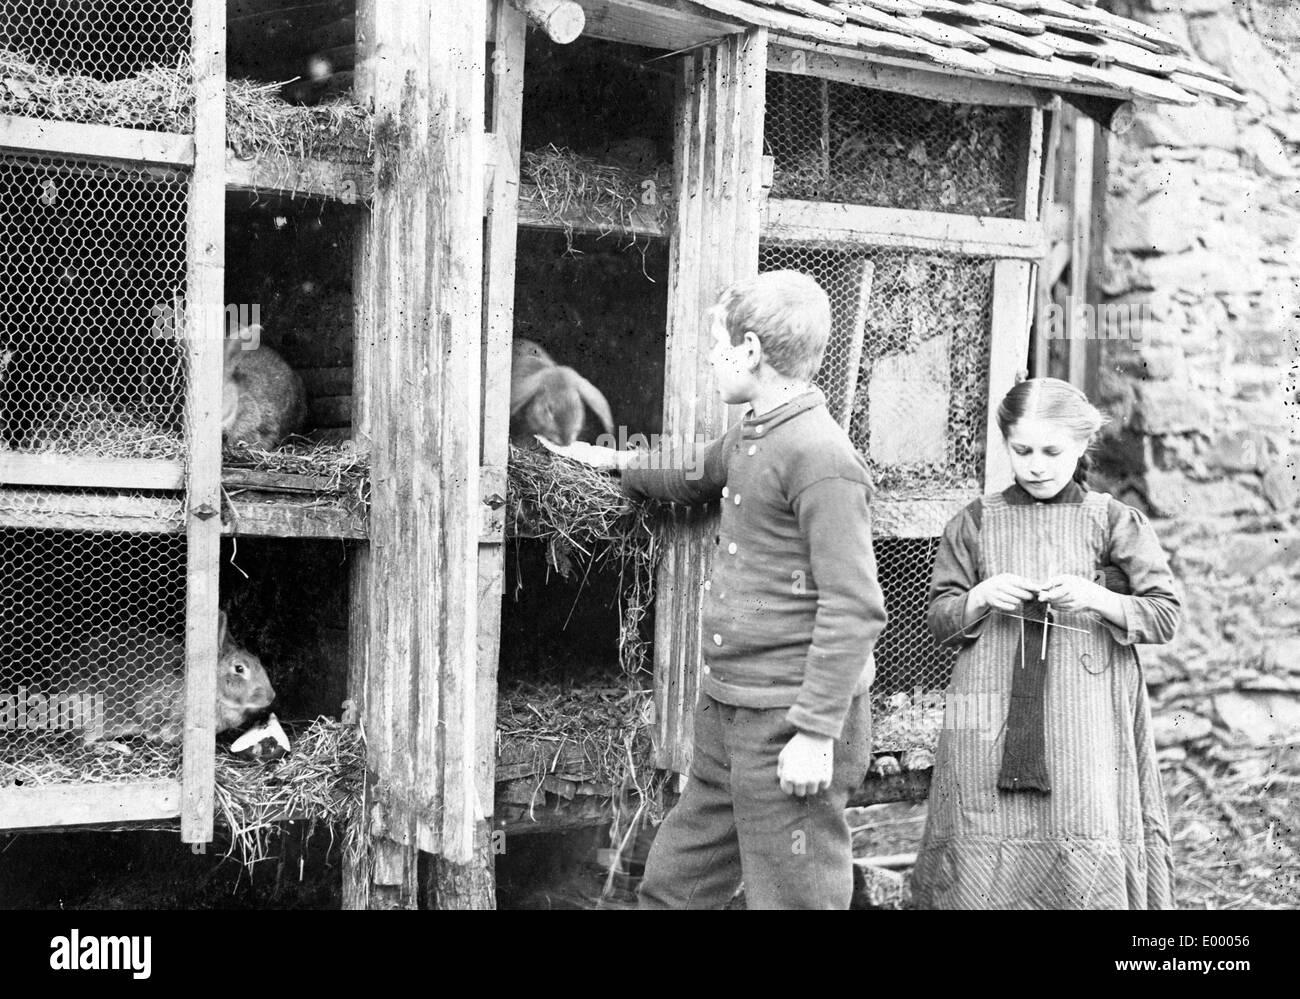 Rabbit breeding during the war, 1917 - Stock Image